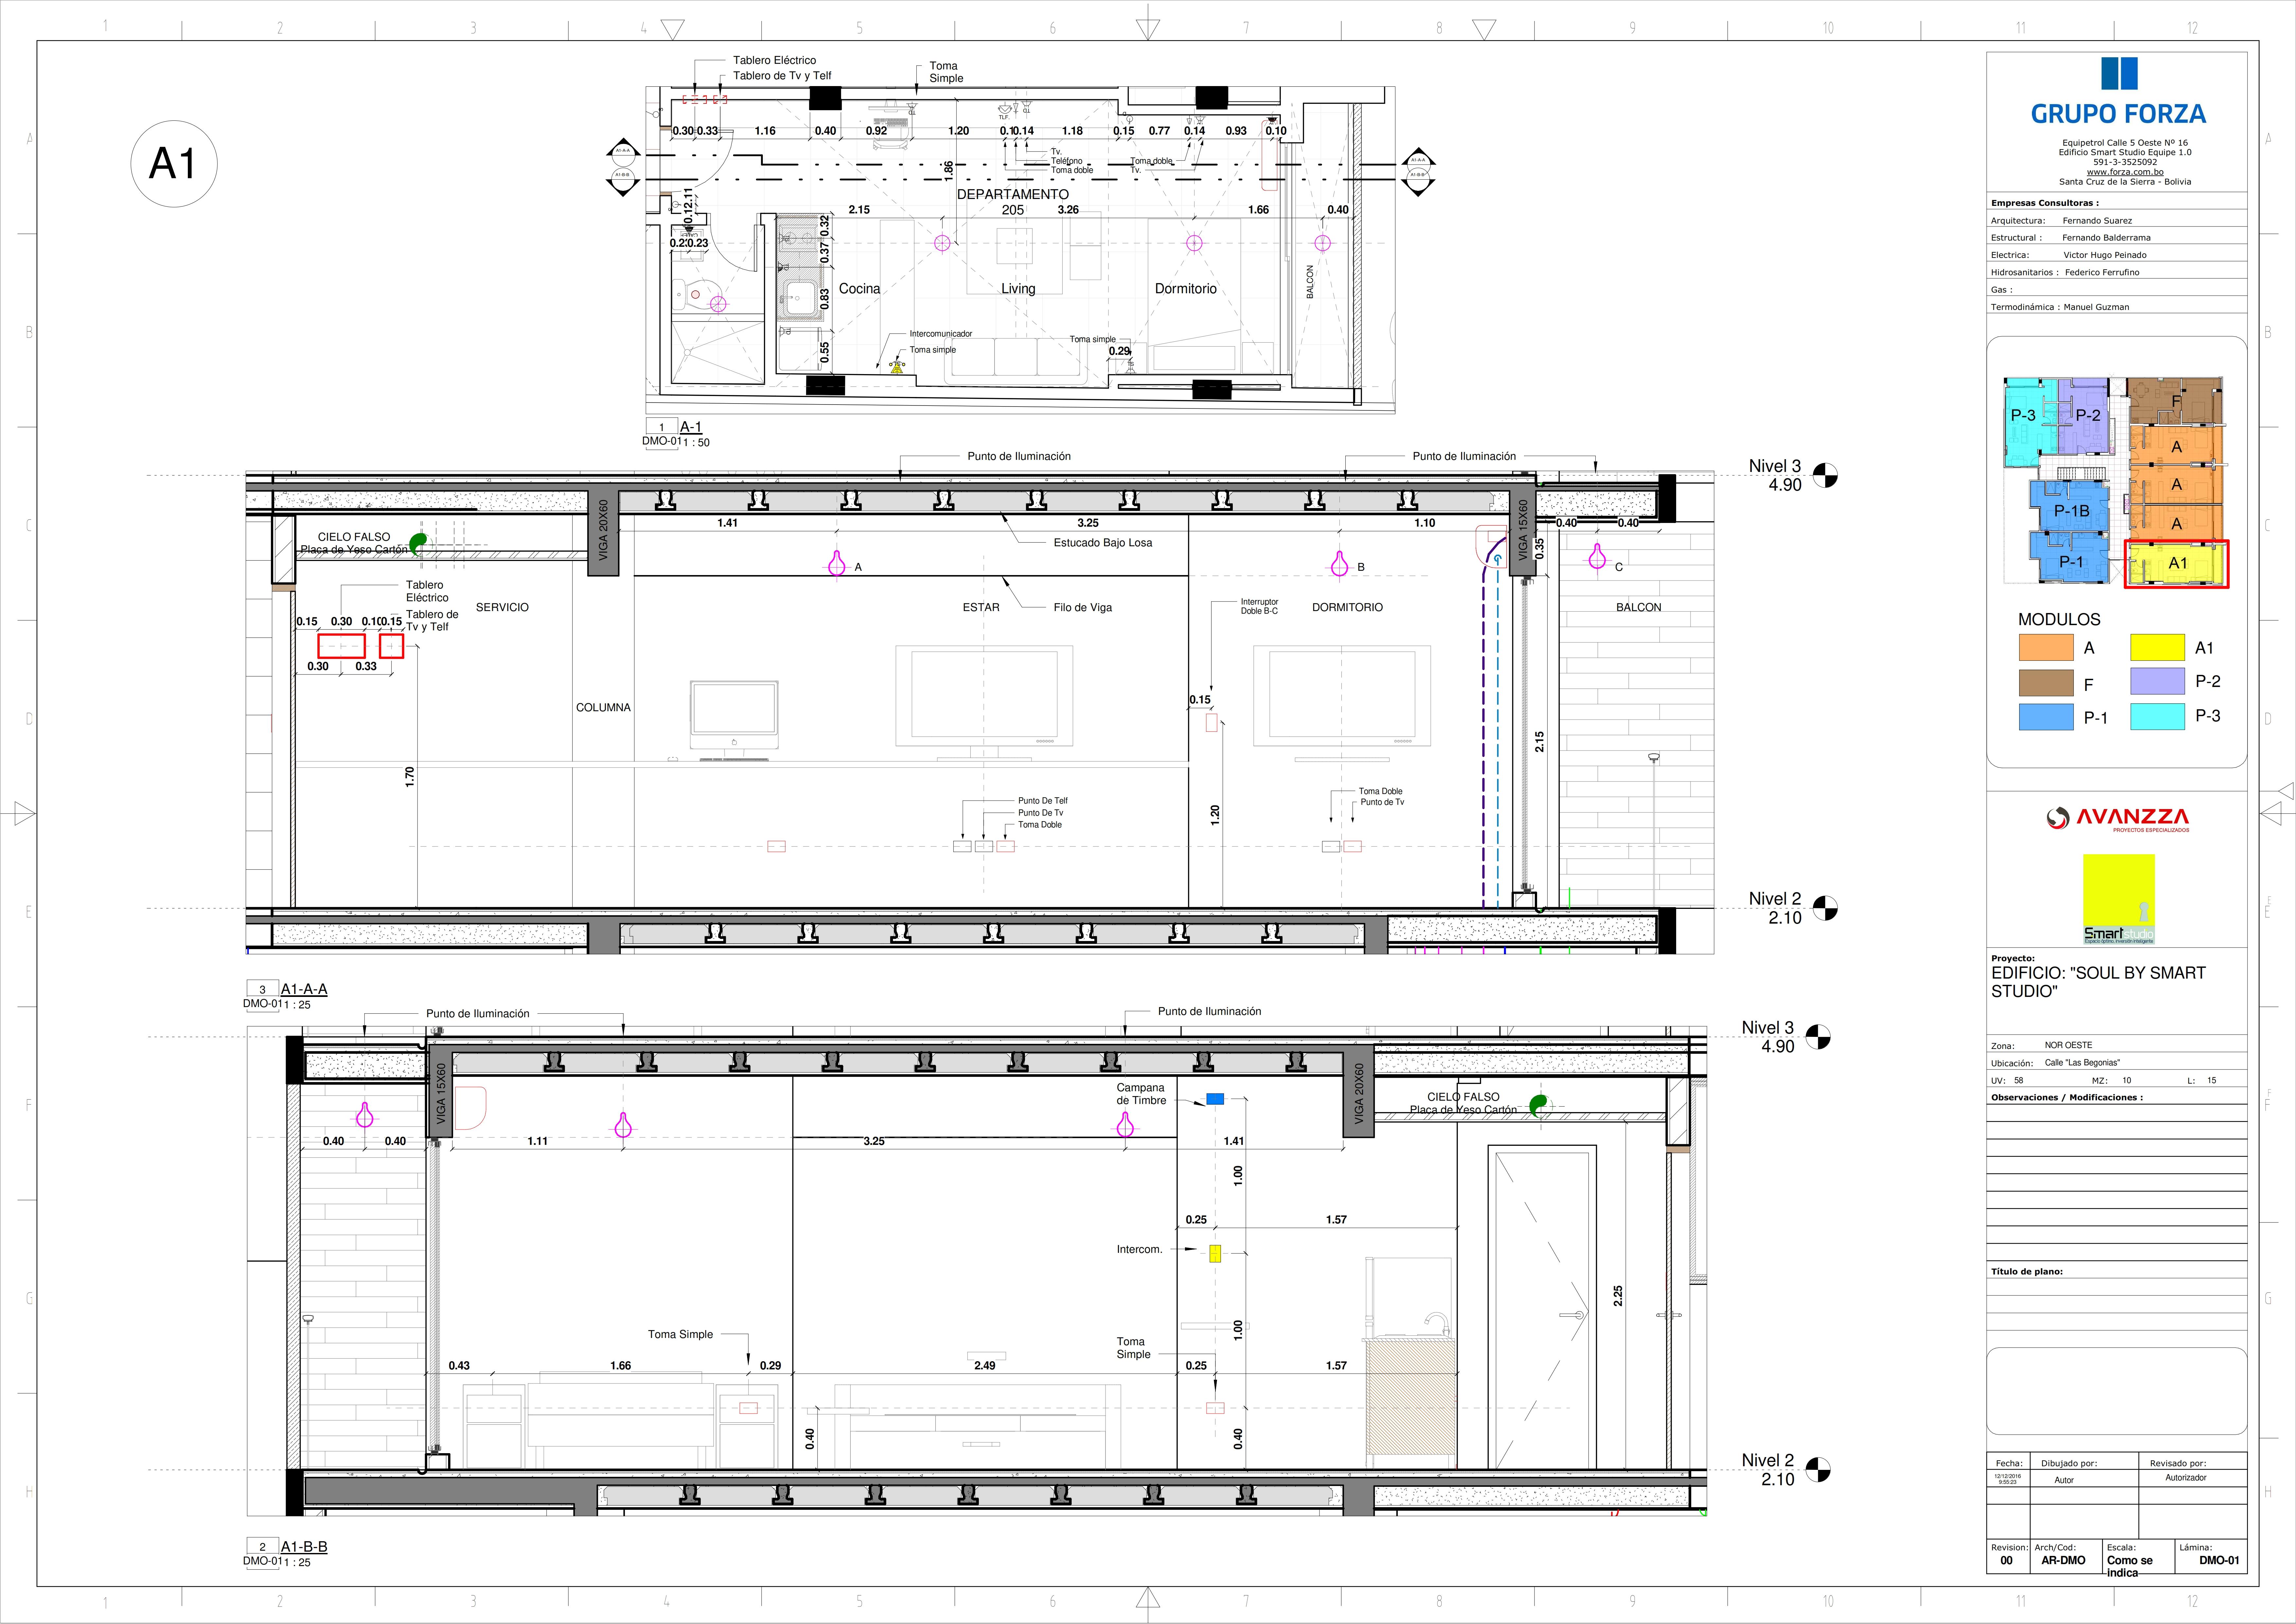 Solucionado croquis esquem tico en pie de plano for Pie de plano arquitectonico